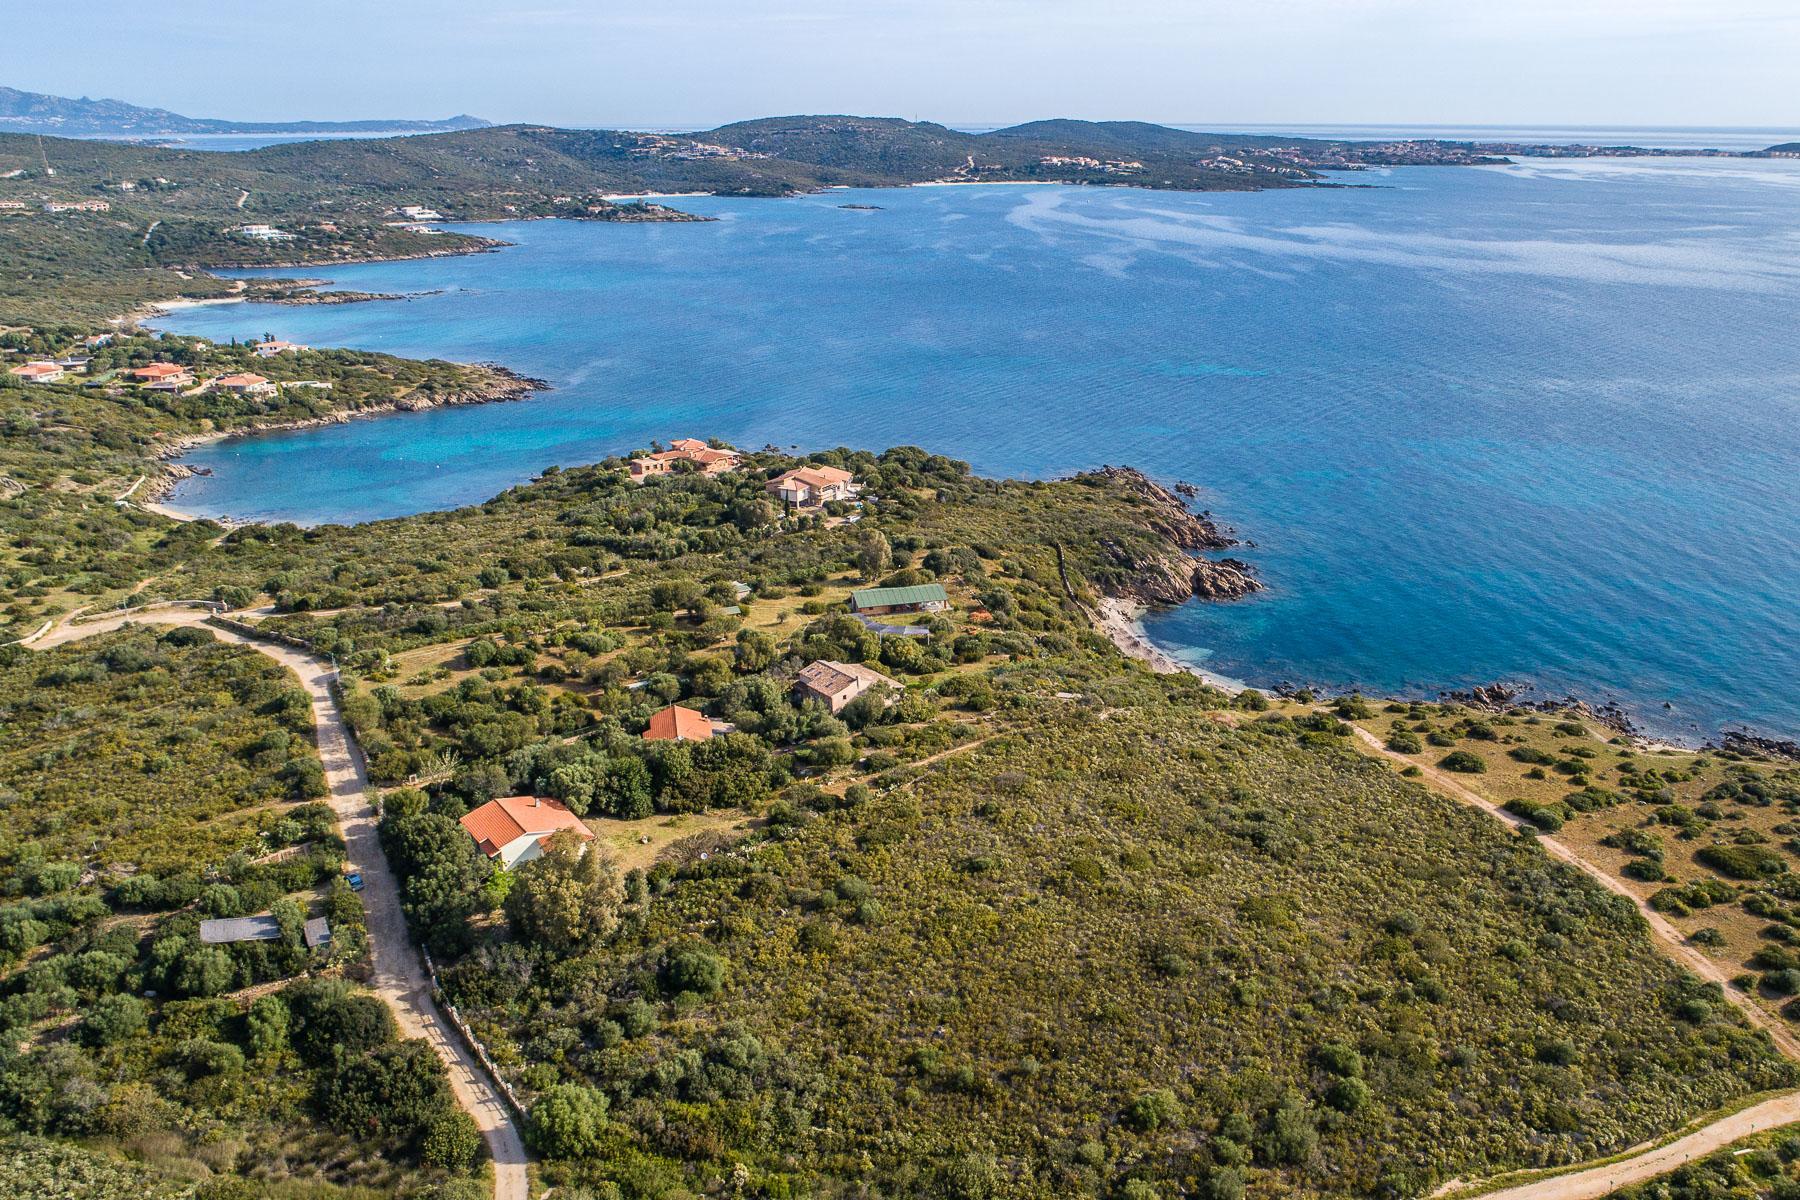 Golfo Aranci Sos Aranzos Wonderfull Villa with direct access to the beach - 23